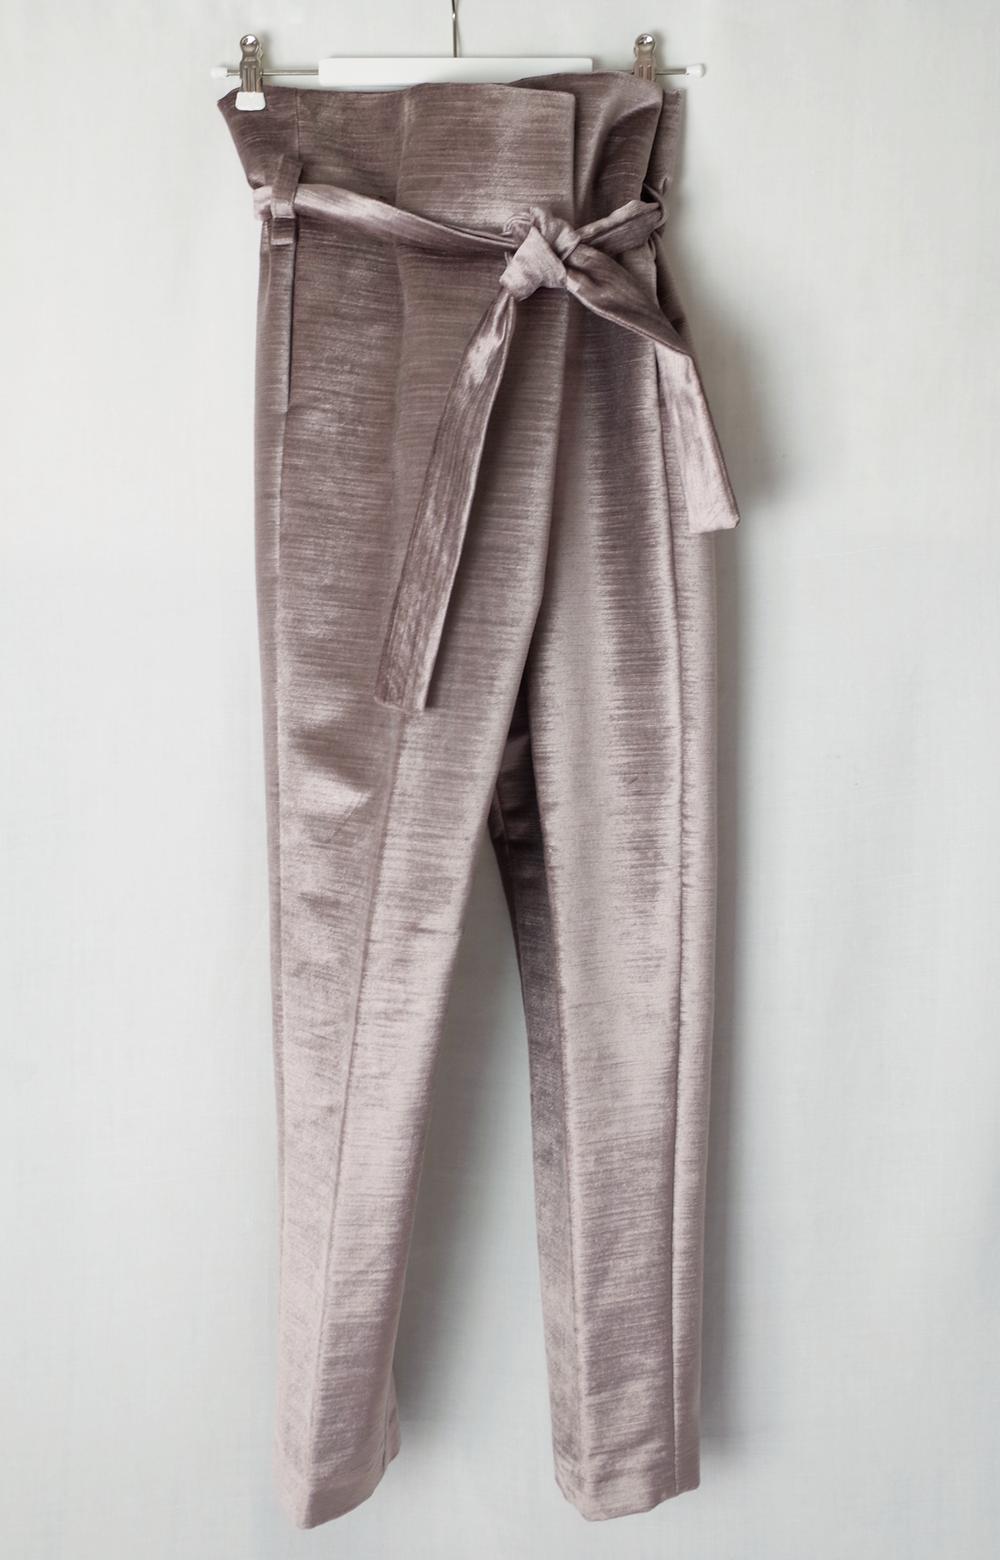 color:light aubergine  material: 100% cotton velour